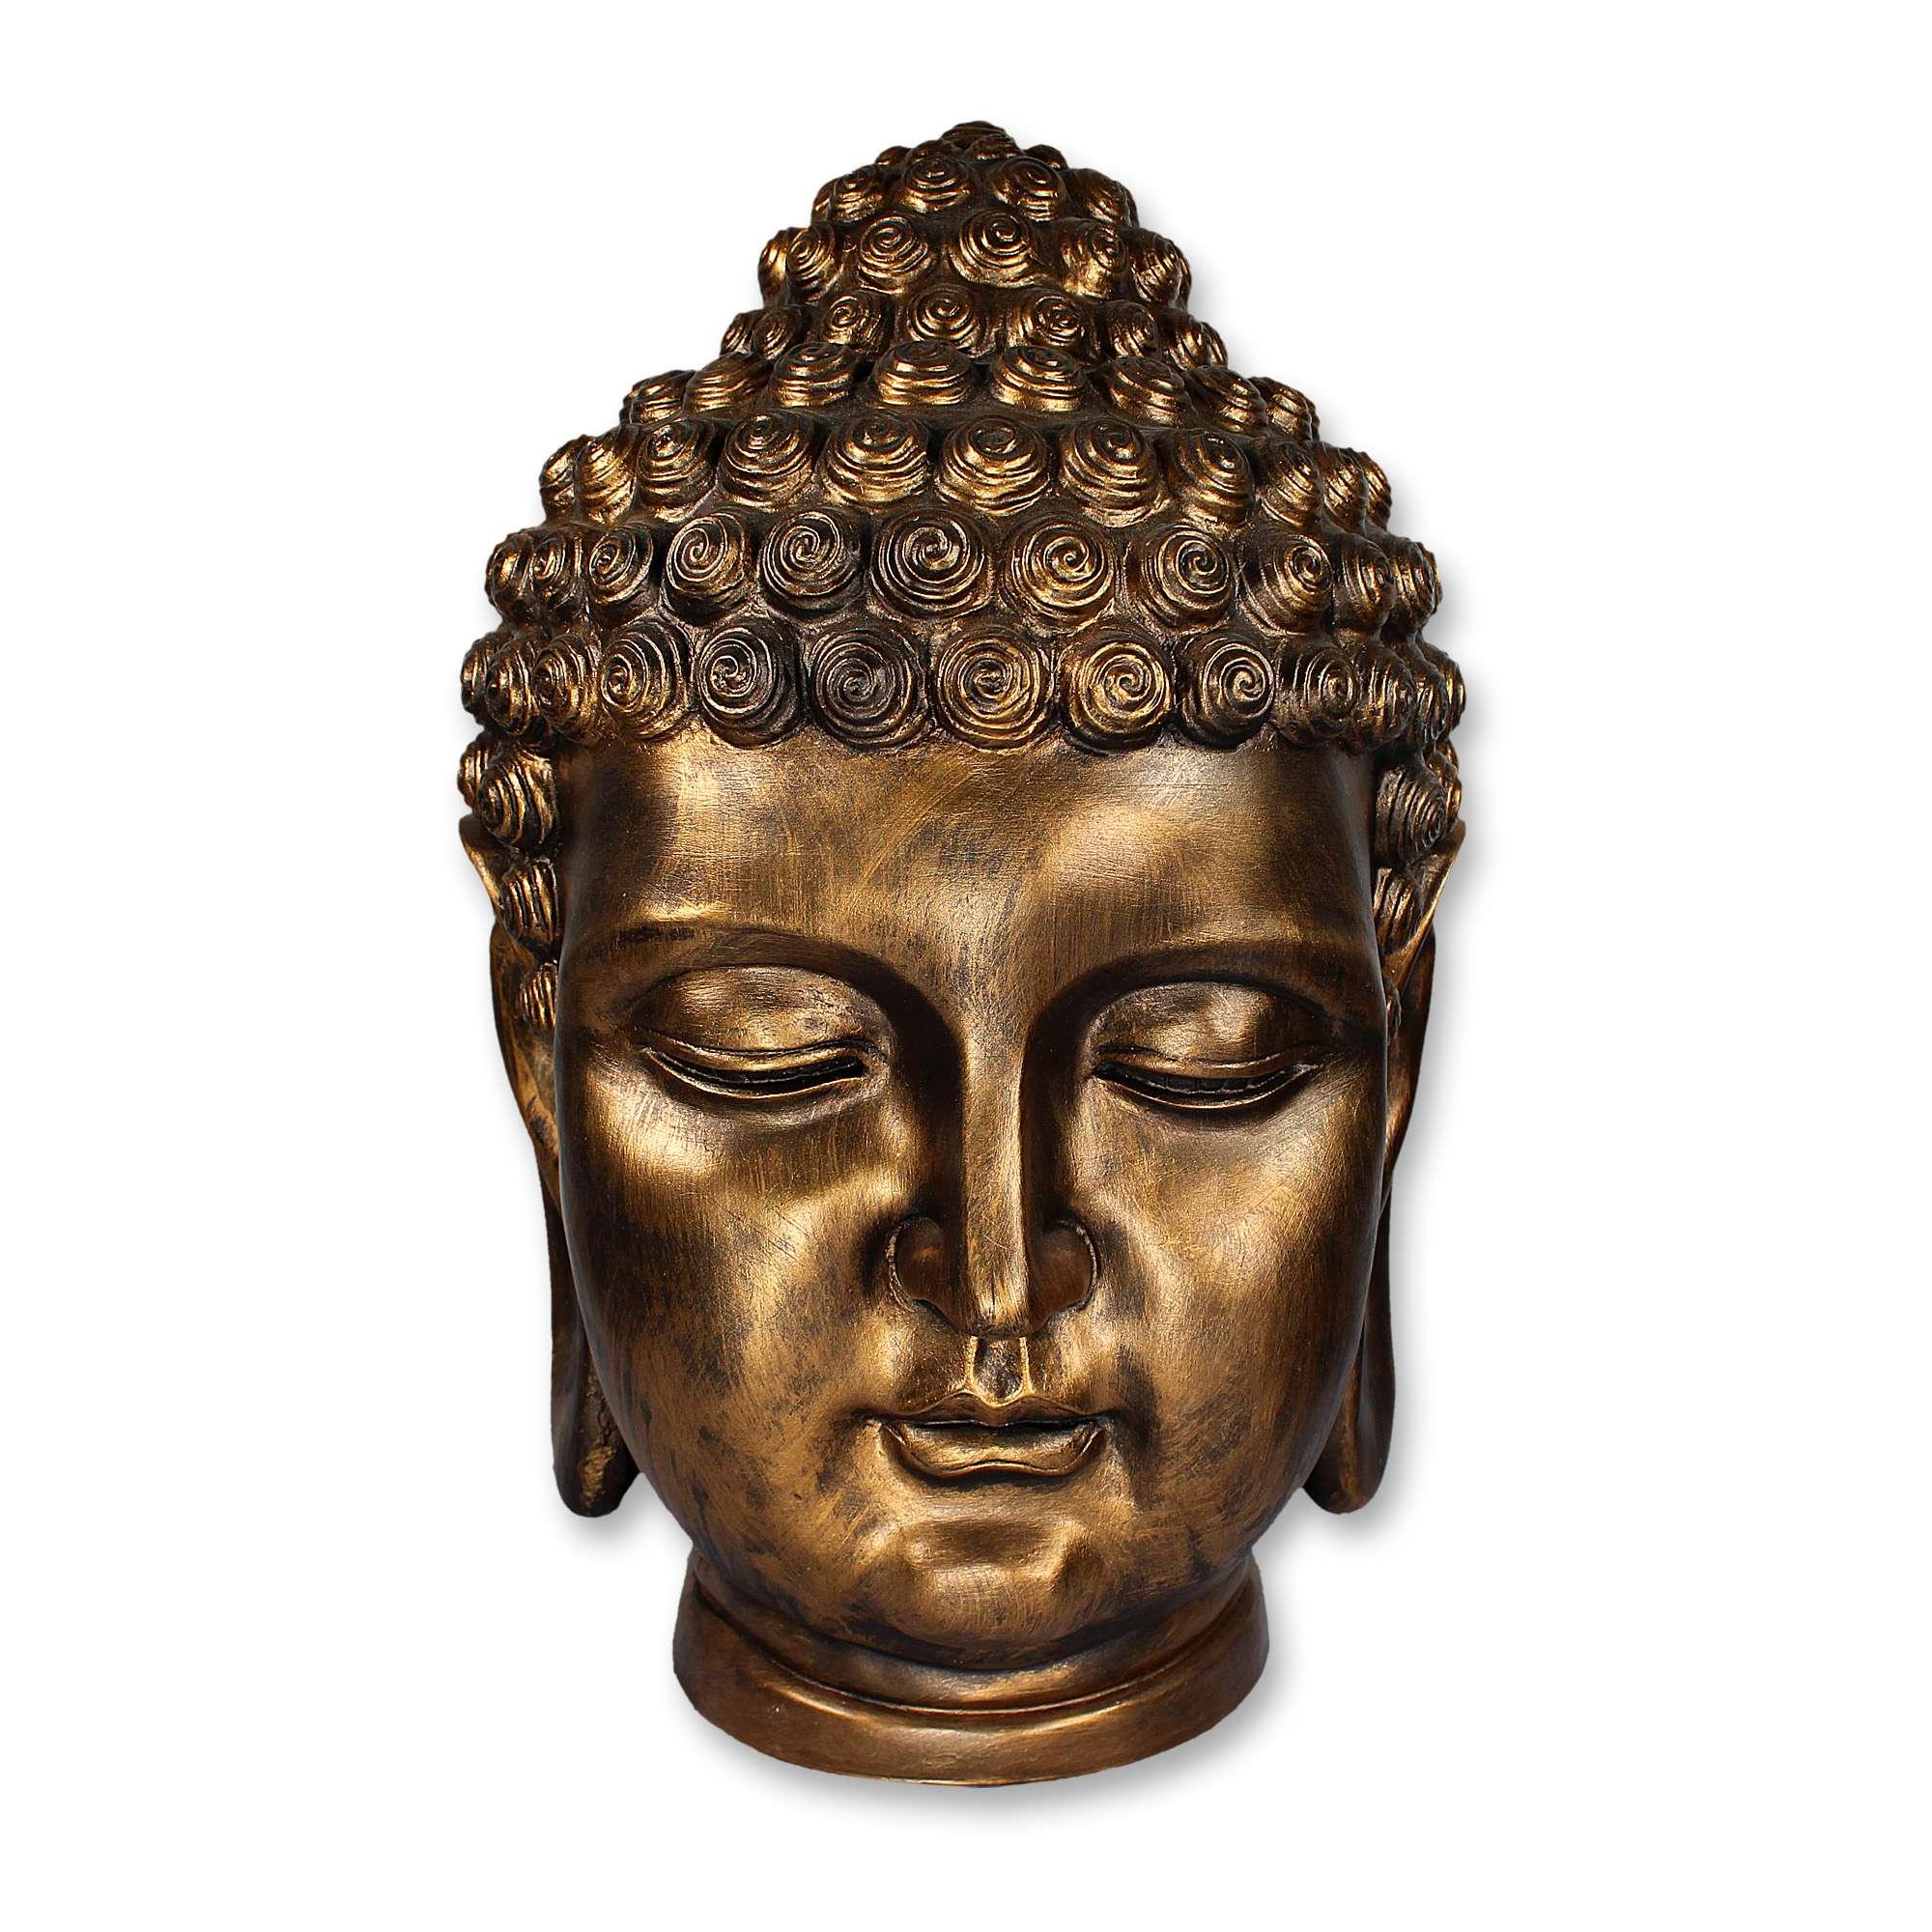 buddha buddhakopf design figur kopf skulptur xxl deko altbronze 50 cm ebay. Black Bedroom Furniture Sets. Home Design Ideas